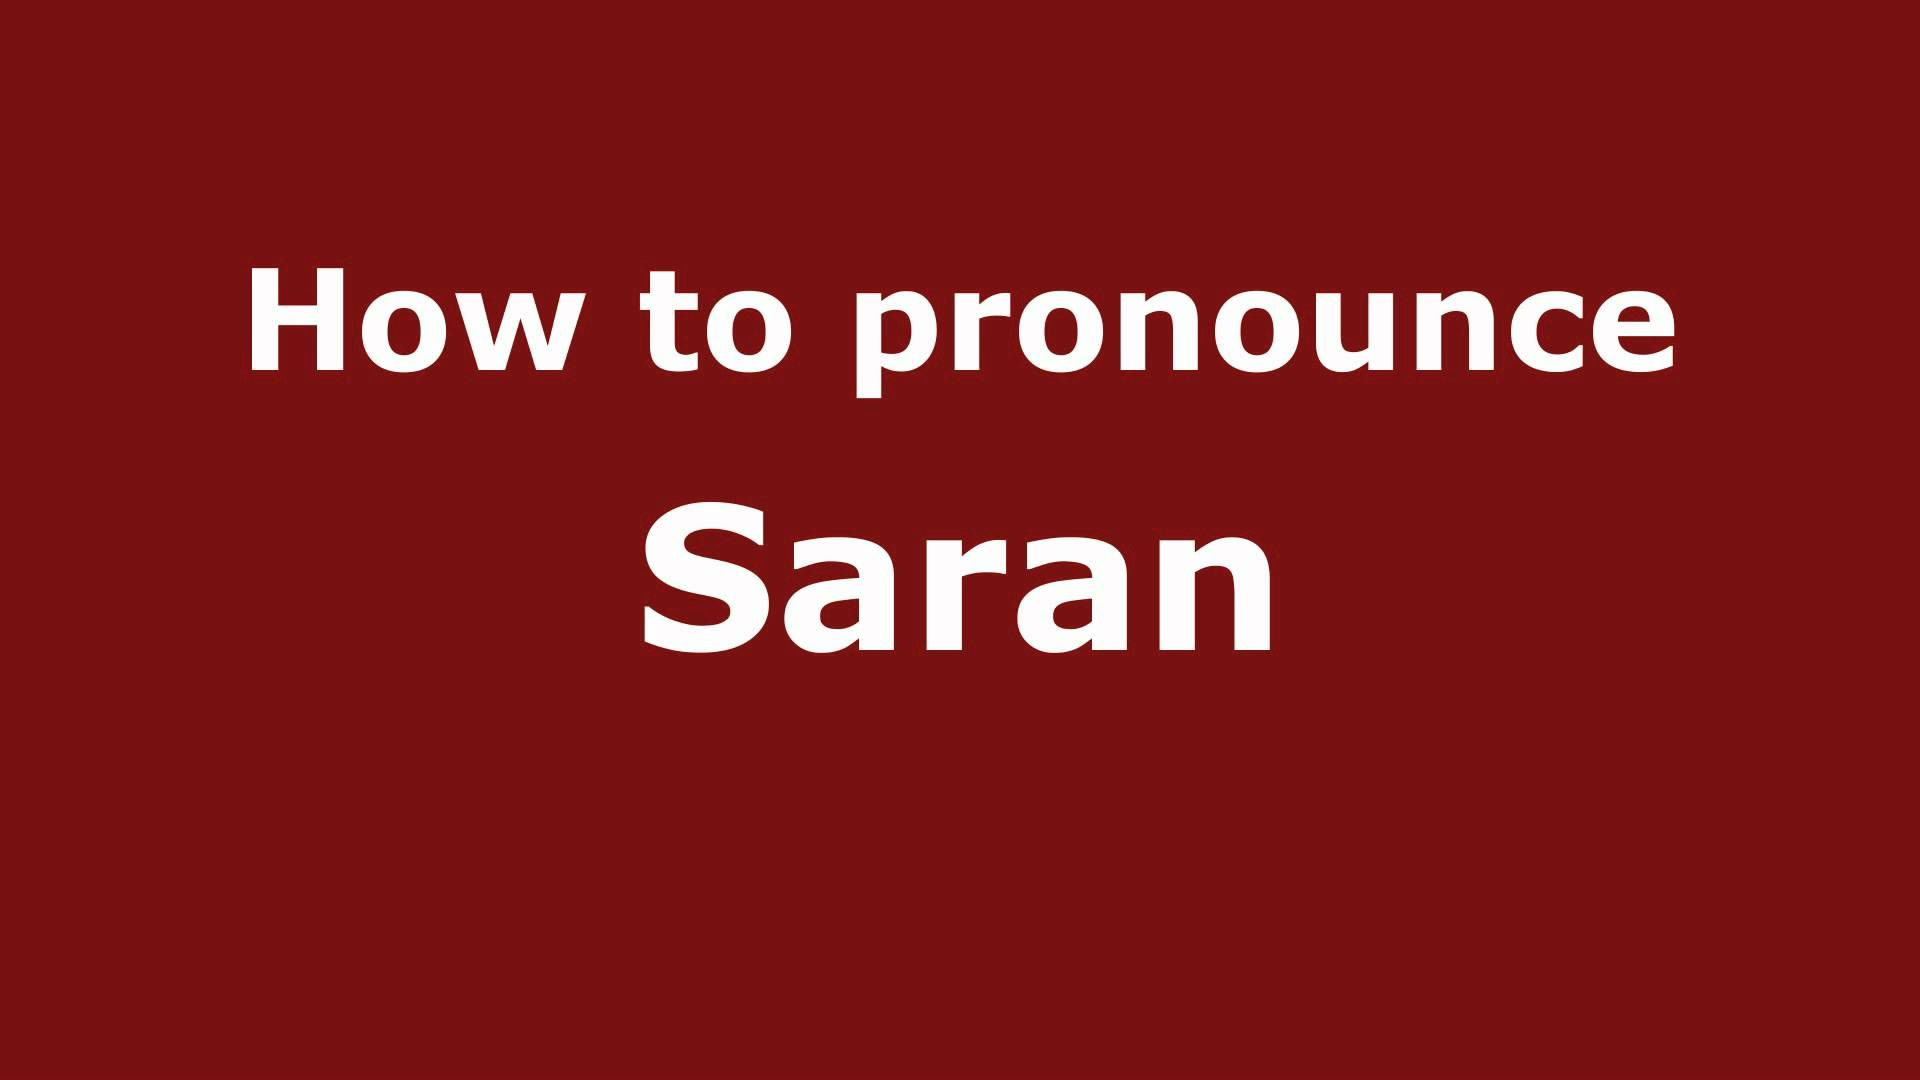 Mongolia Pronounce Names How To Pronounce Saran How To